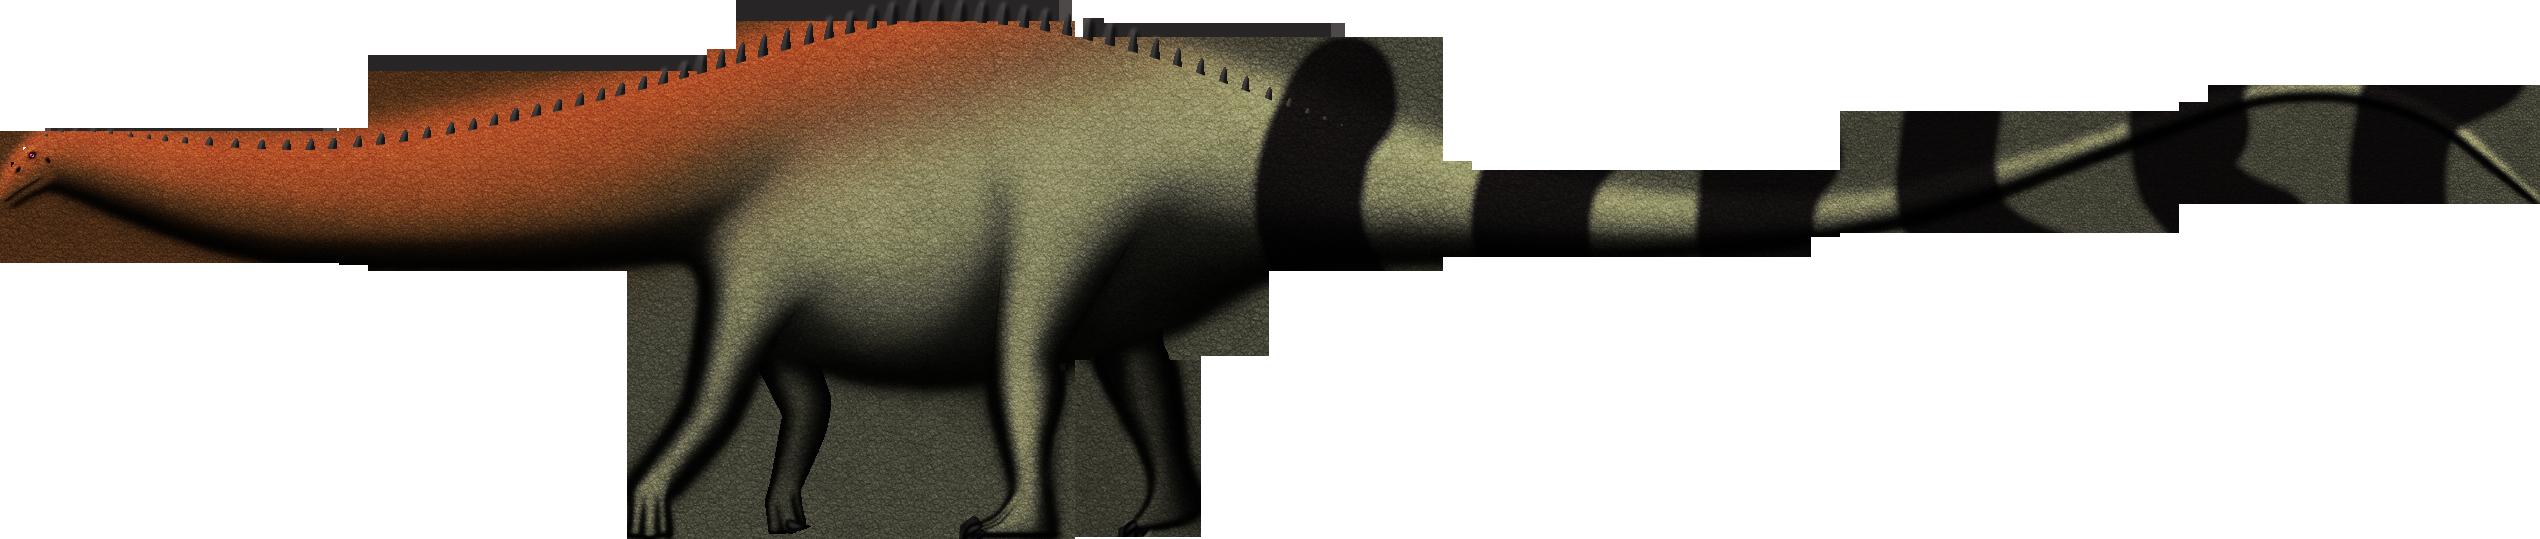 Brontosaurus yahnahpin